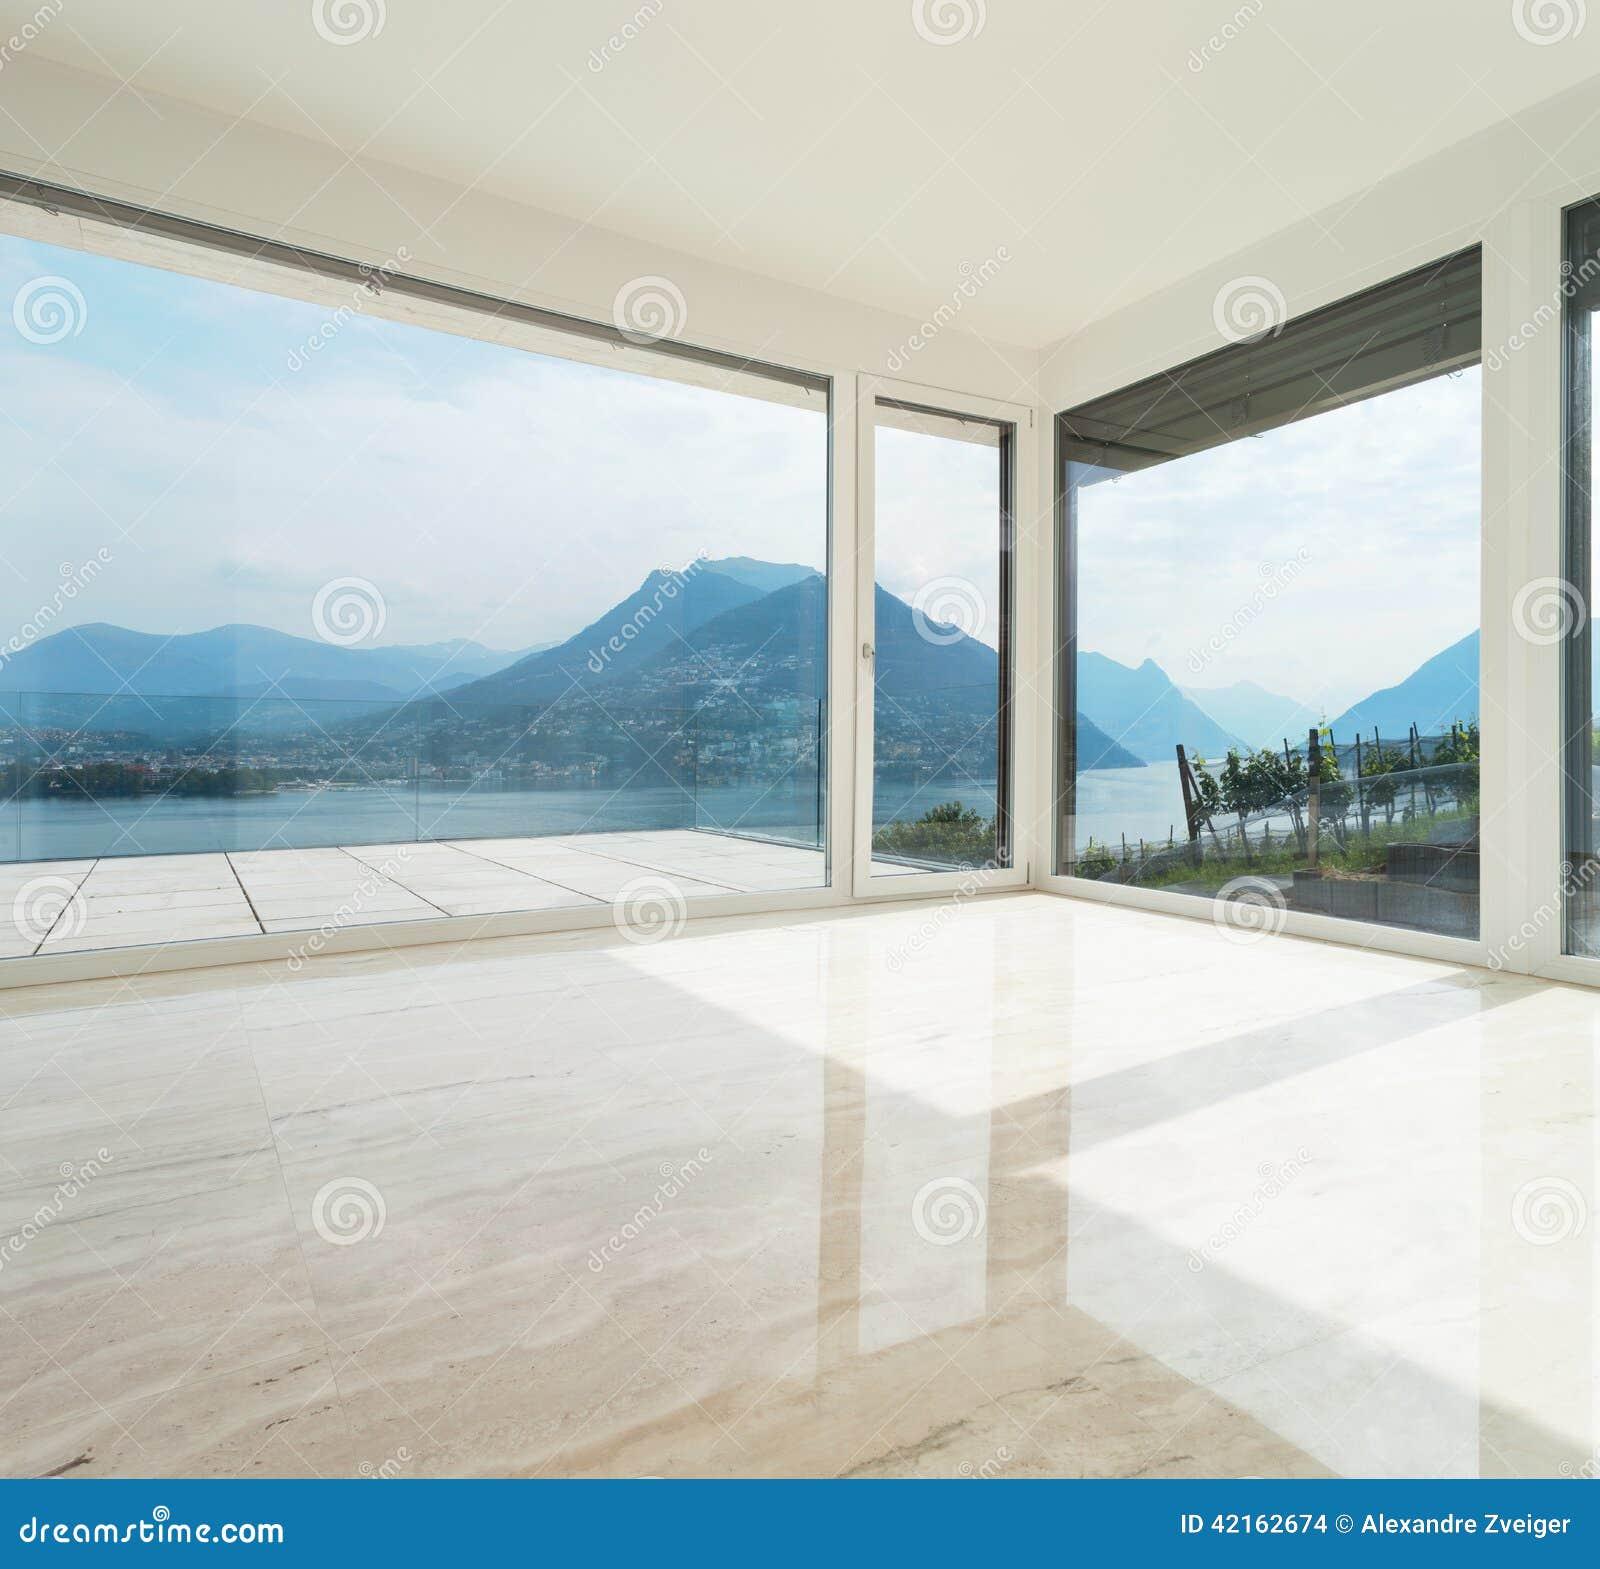 Bel appartement terrasse salon vide photo stock image - Spa terrasse appartement ...